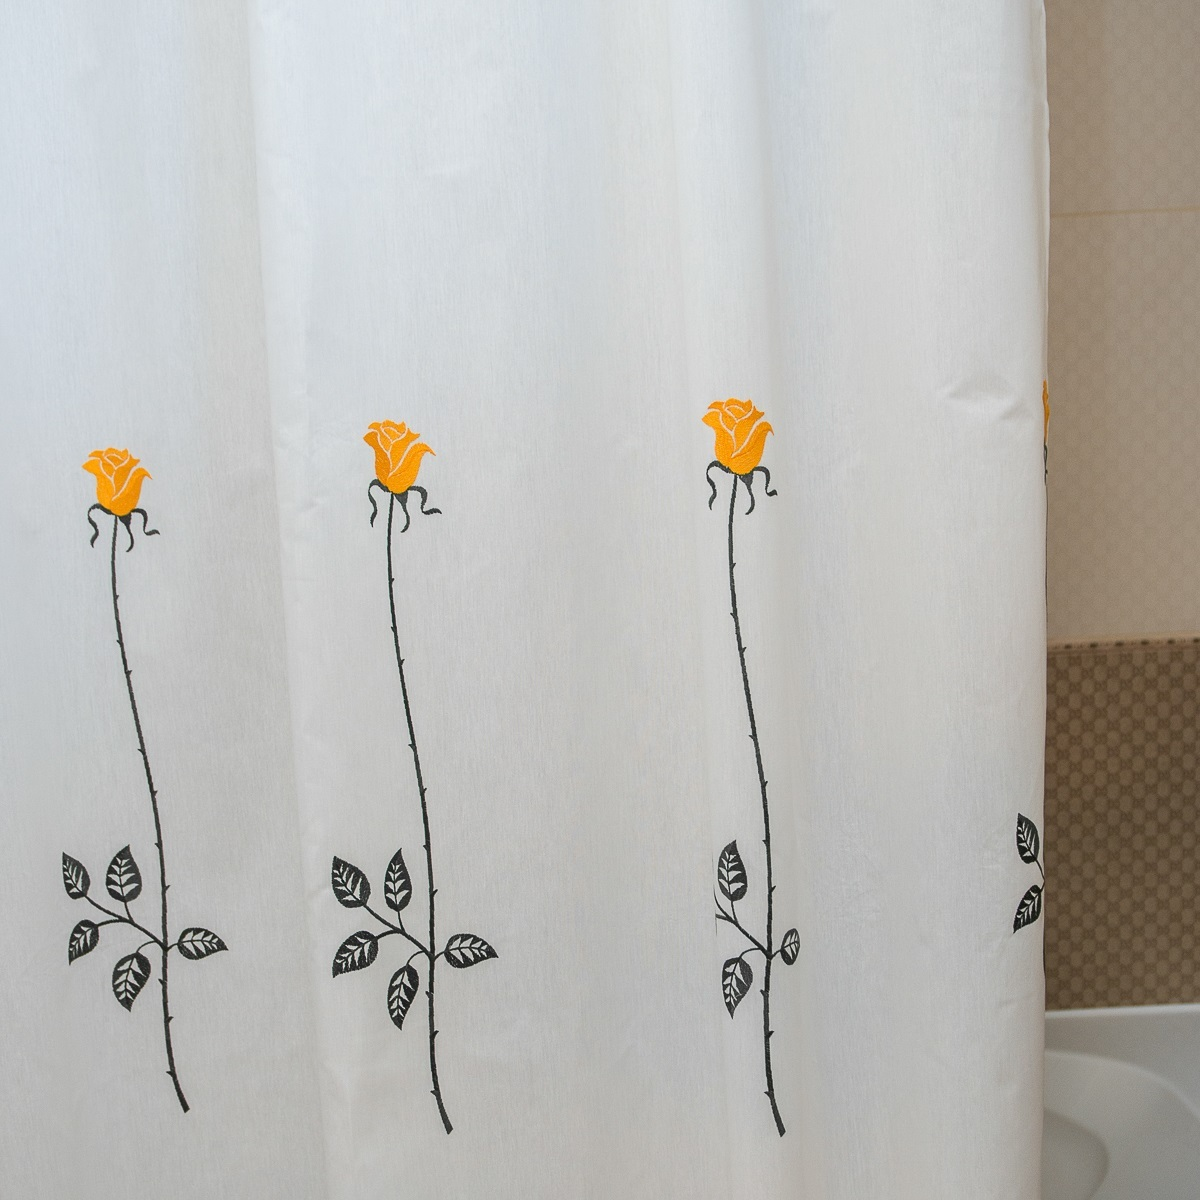 Шторки для ванной Шторка для ванной 180x200 Arti-Deco Rosas C. Yellow elitnaya-shtorka-dlya-vannoy-rosas-c-yellow-ot-arti-deco-ispaniya.jpg